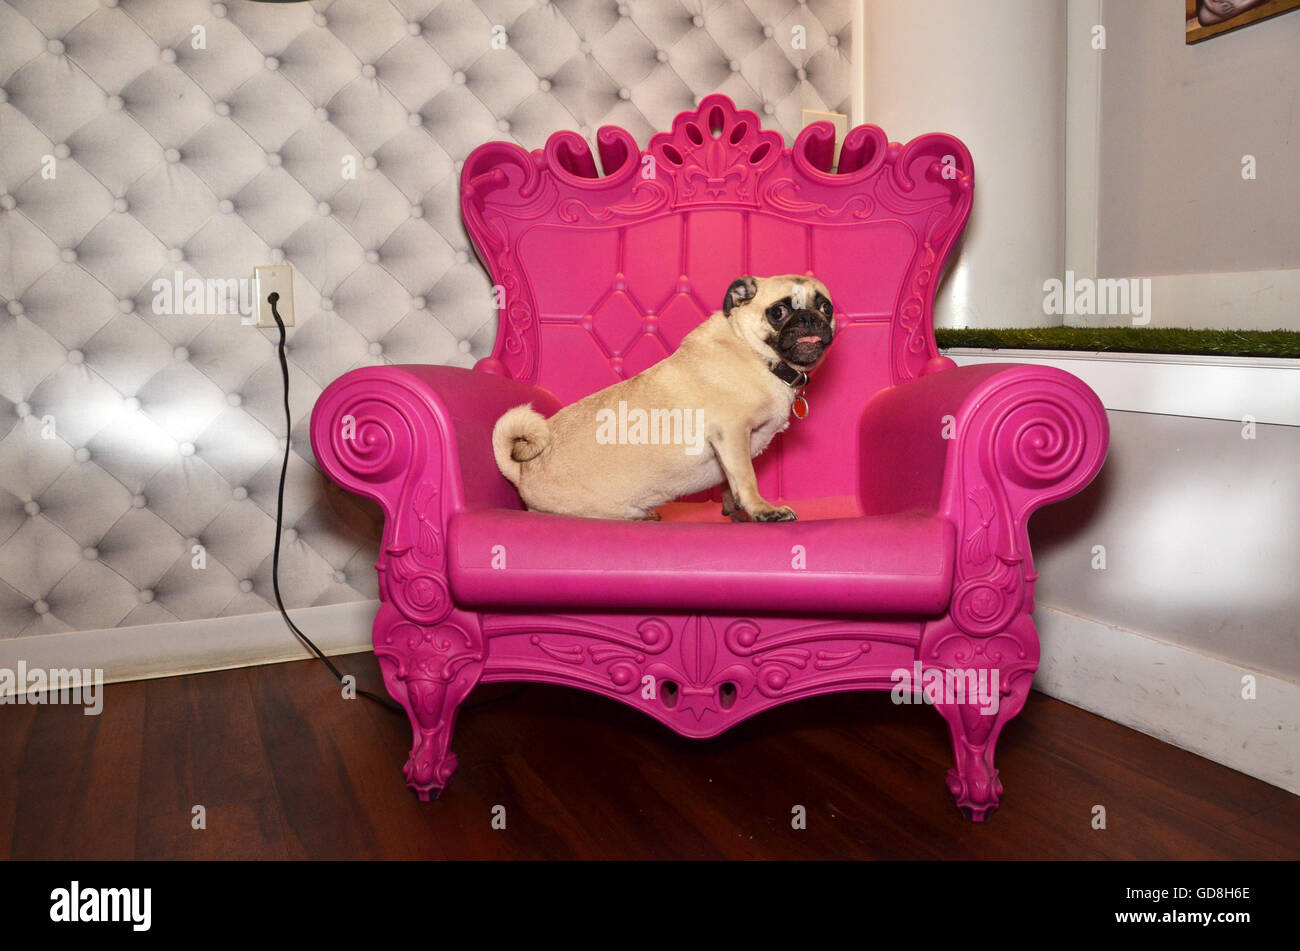 D Pet Hotels Chelsea Manhattan new york USA pug on pink throne - Stock Image